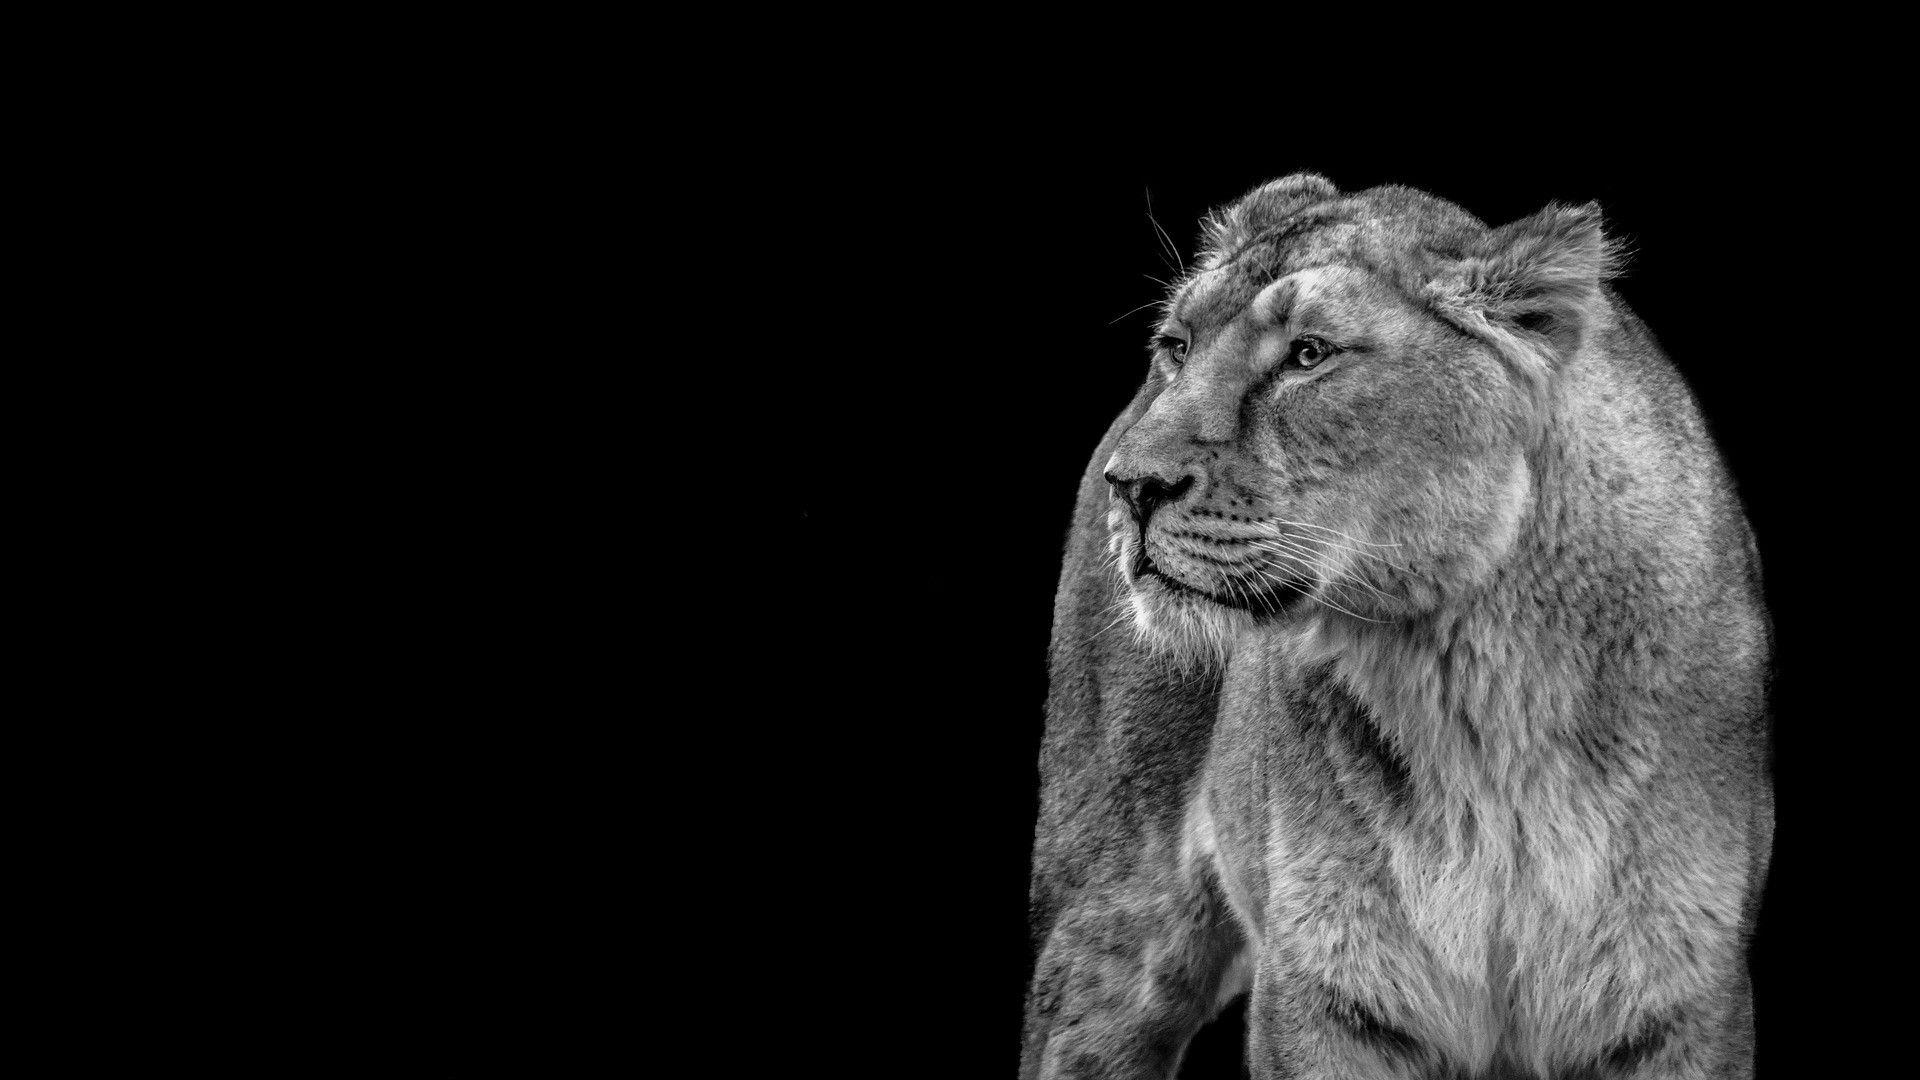 Lion Black And White Animal Wallpaper